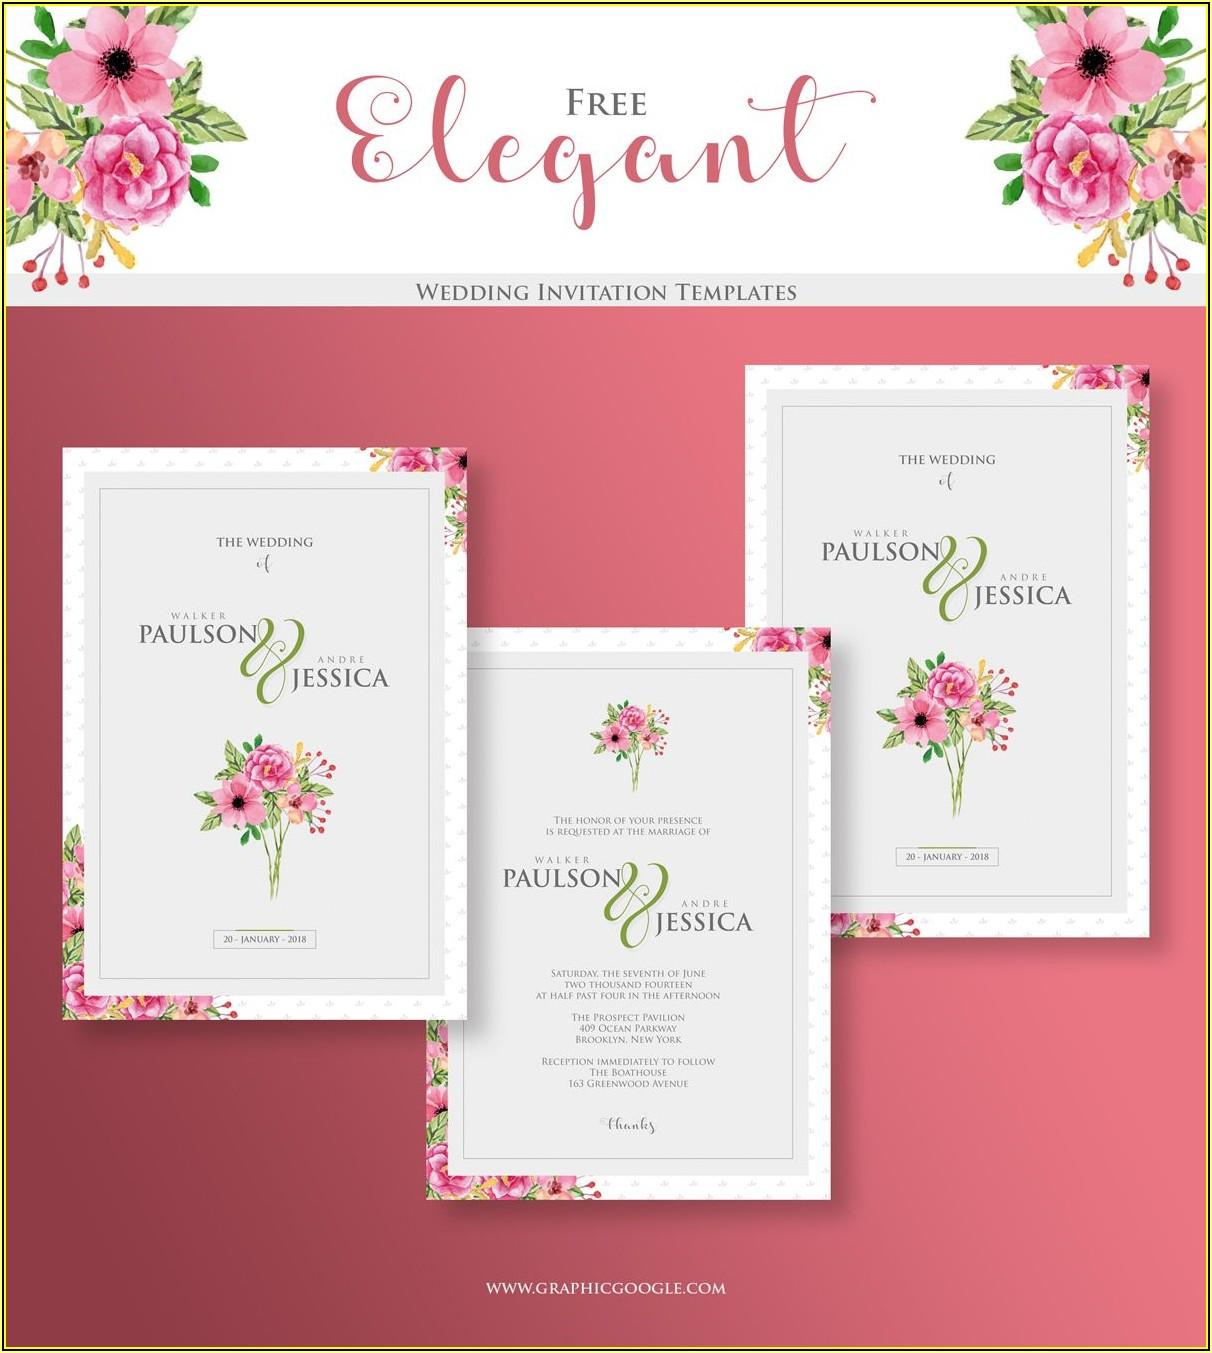 Elegant Invitation Templates Free